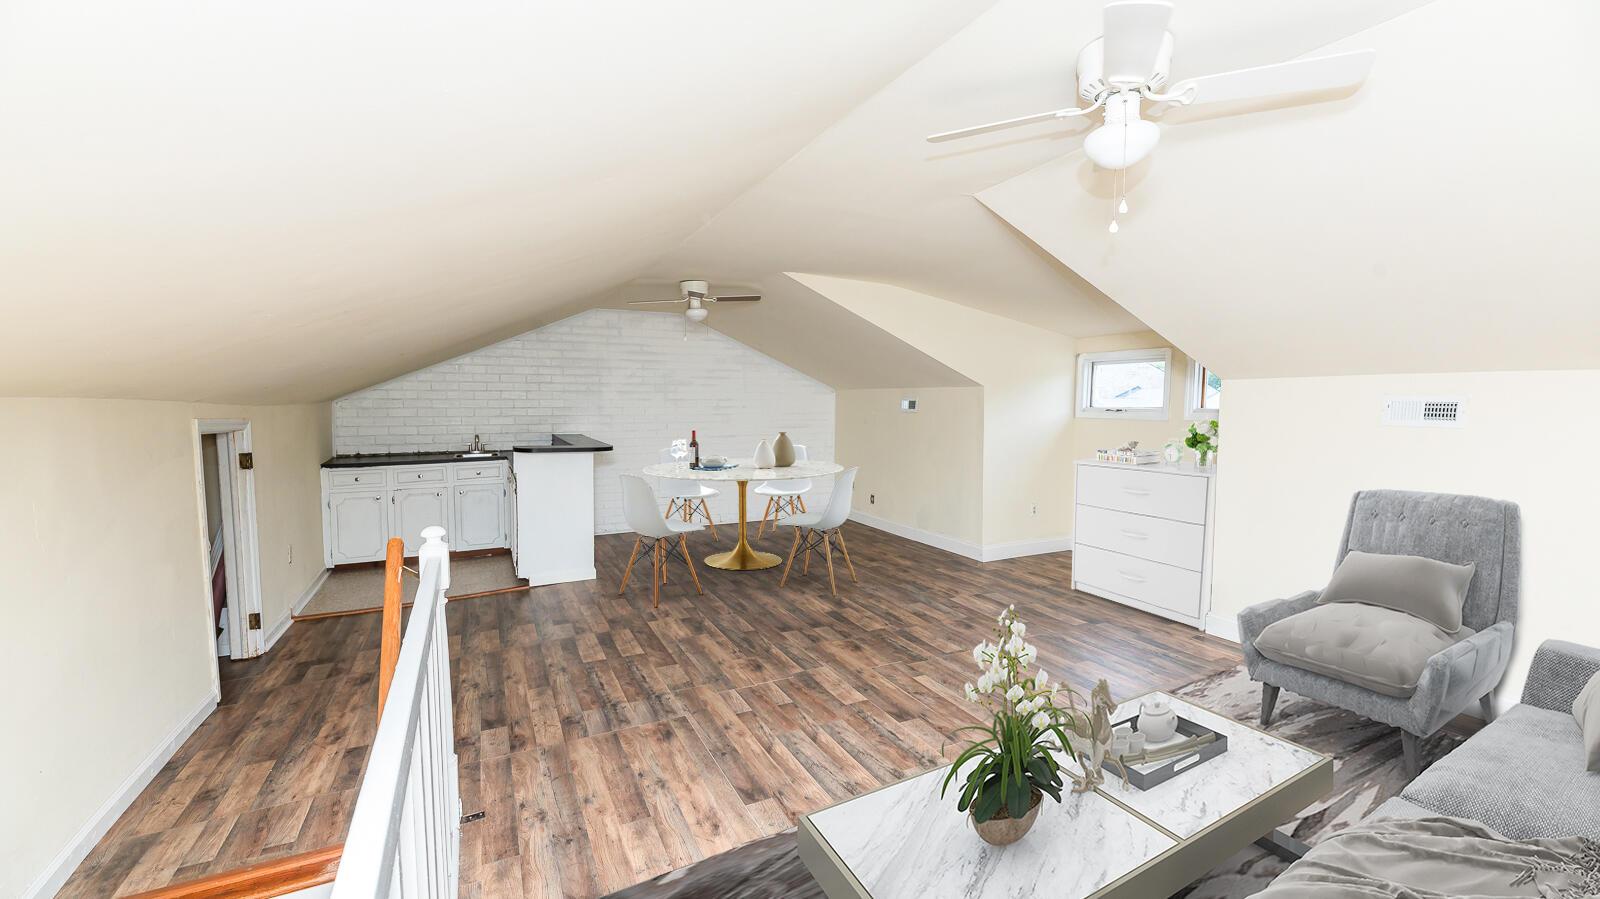 Ashley Villas Homes For Sale - 4315 Briarstone, North Charleston, SC - 14